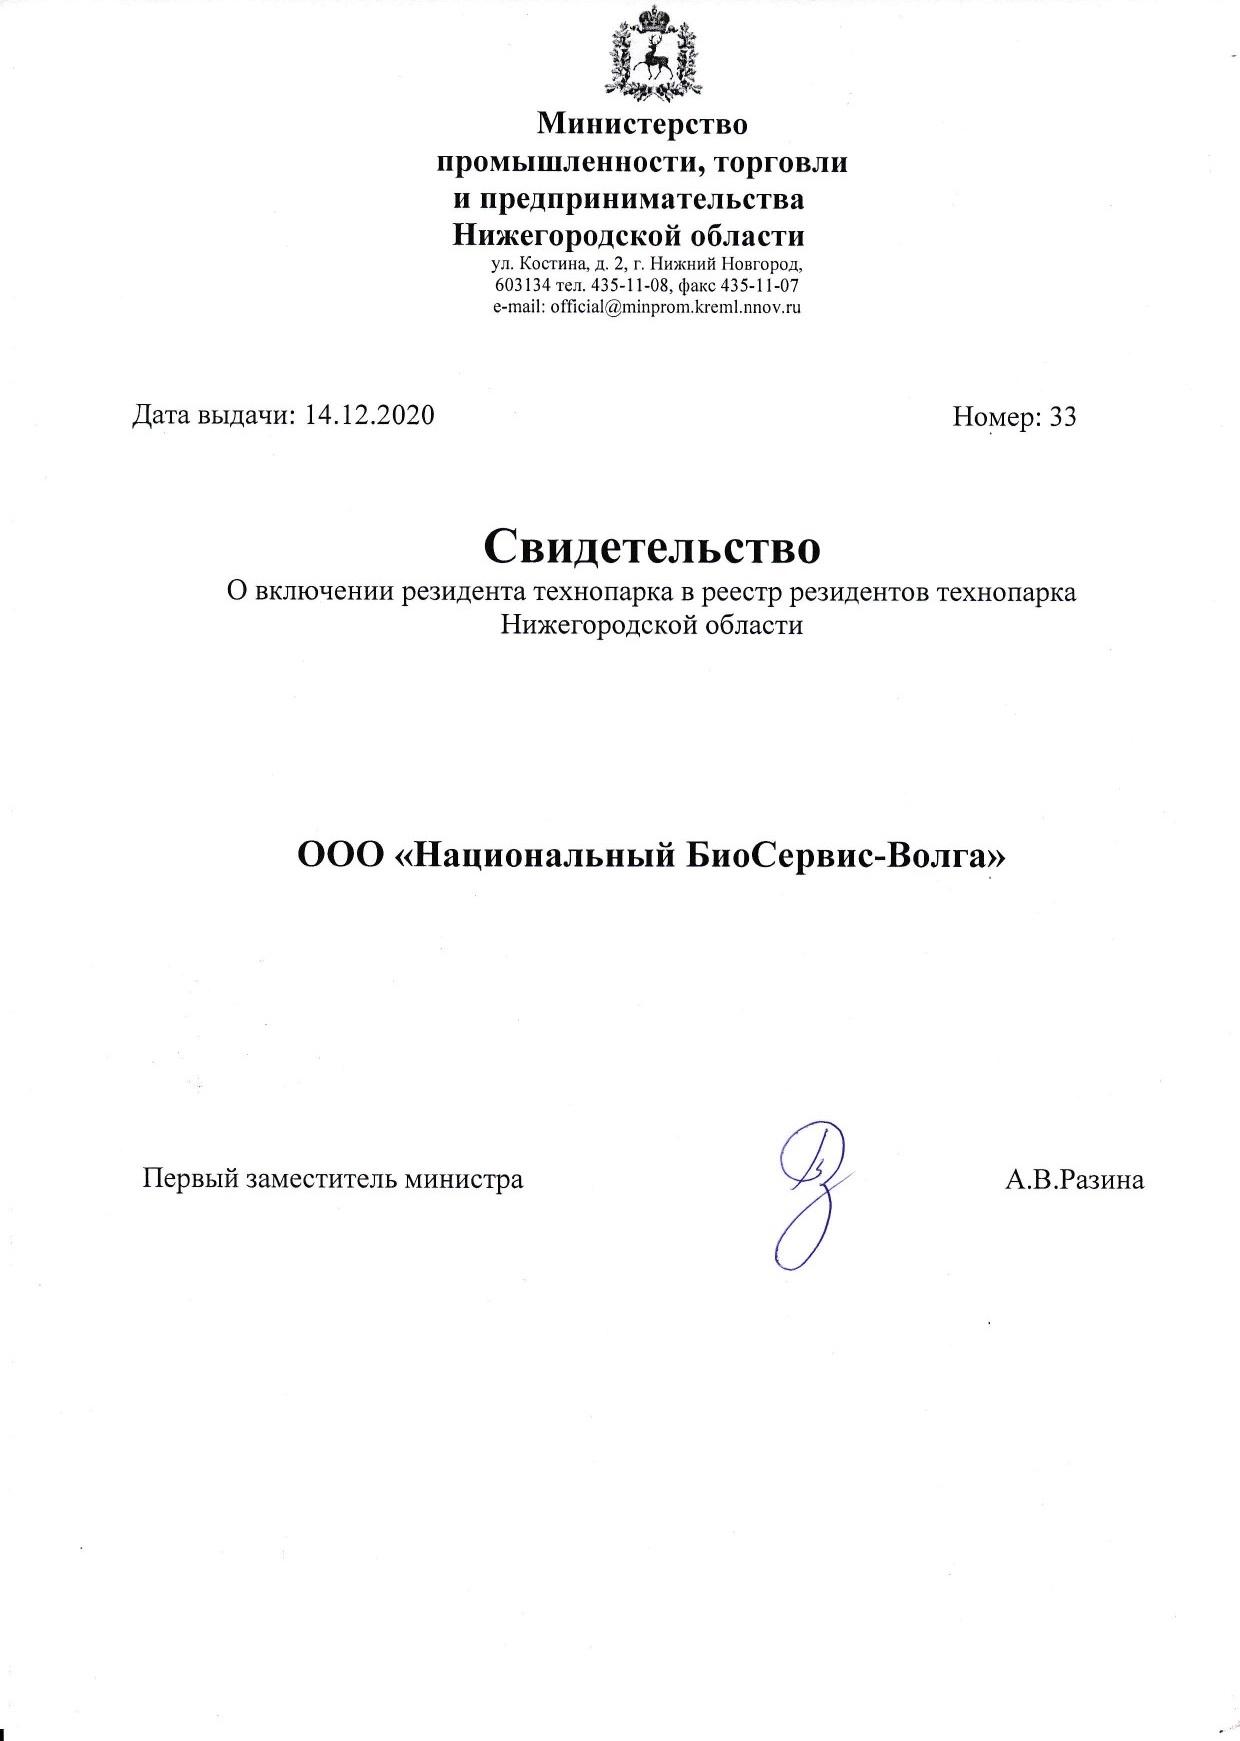 Технопарк Нижегородской области